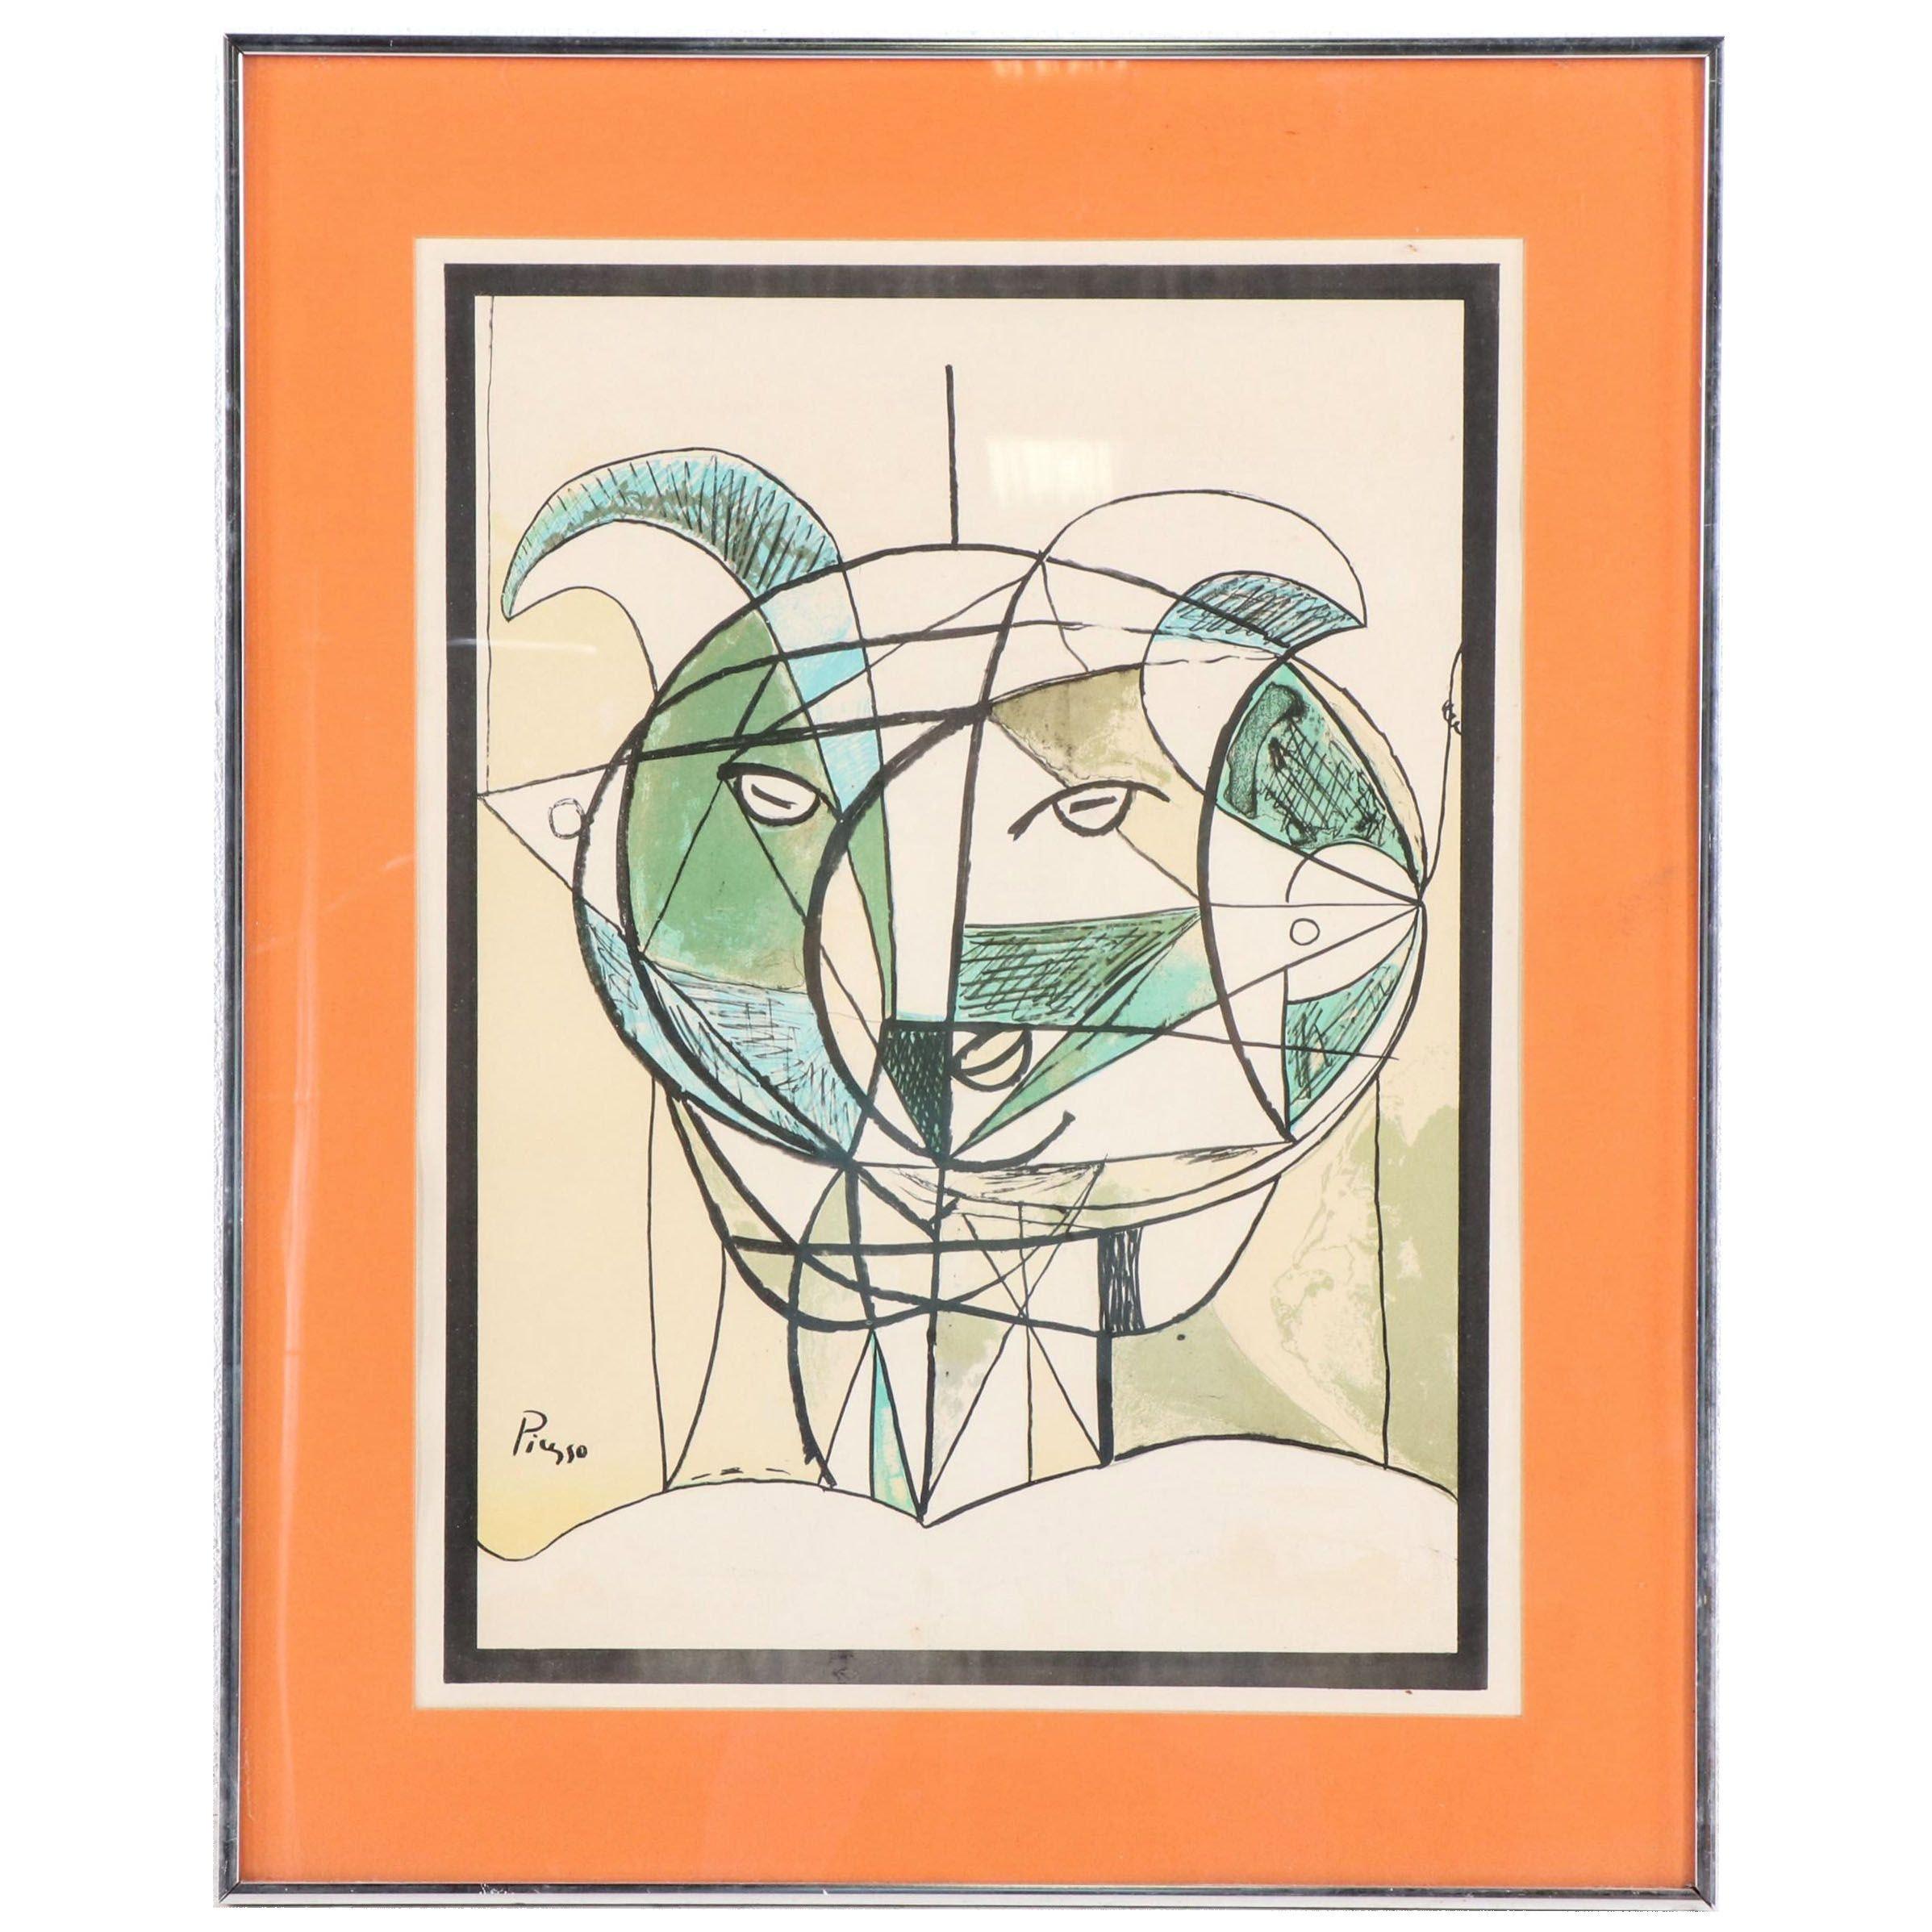 Color Lithograph after Pablo Picasso